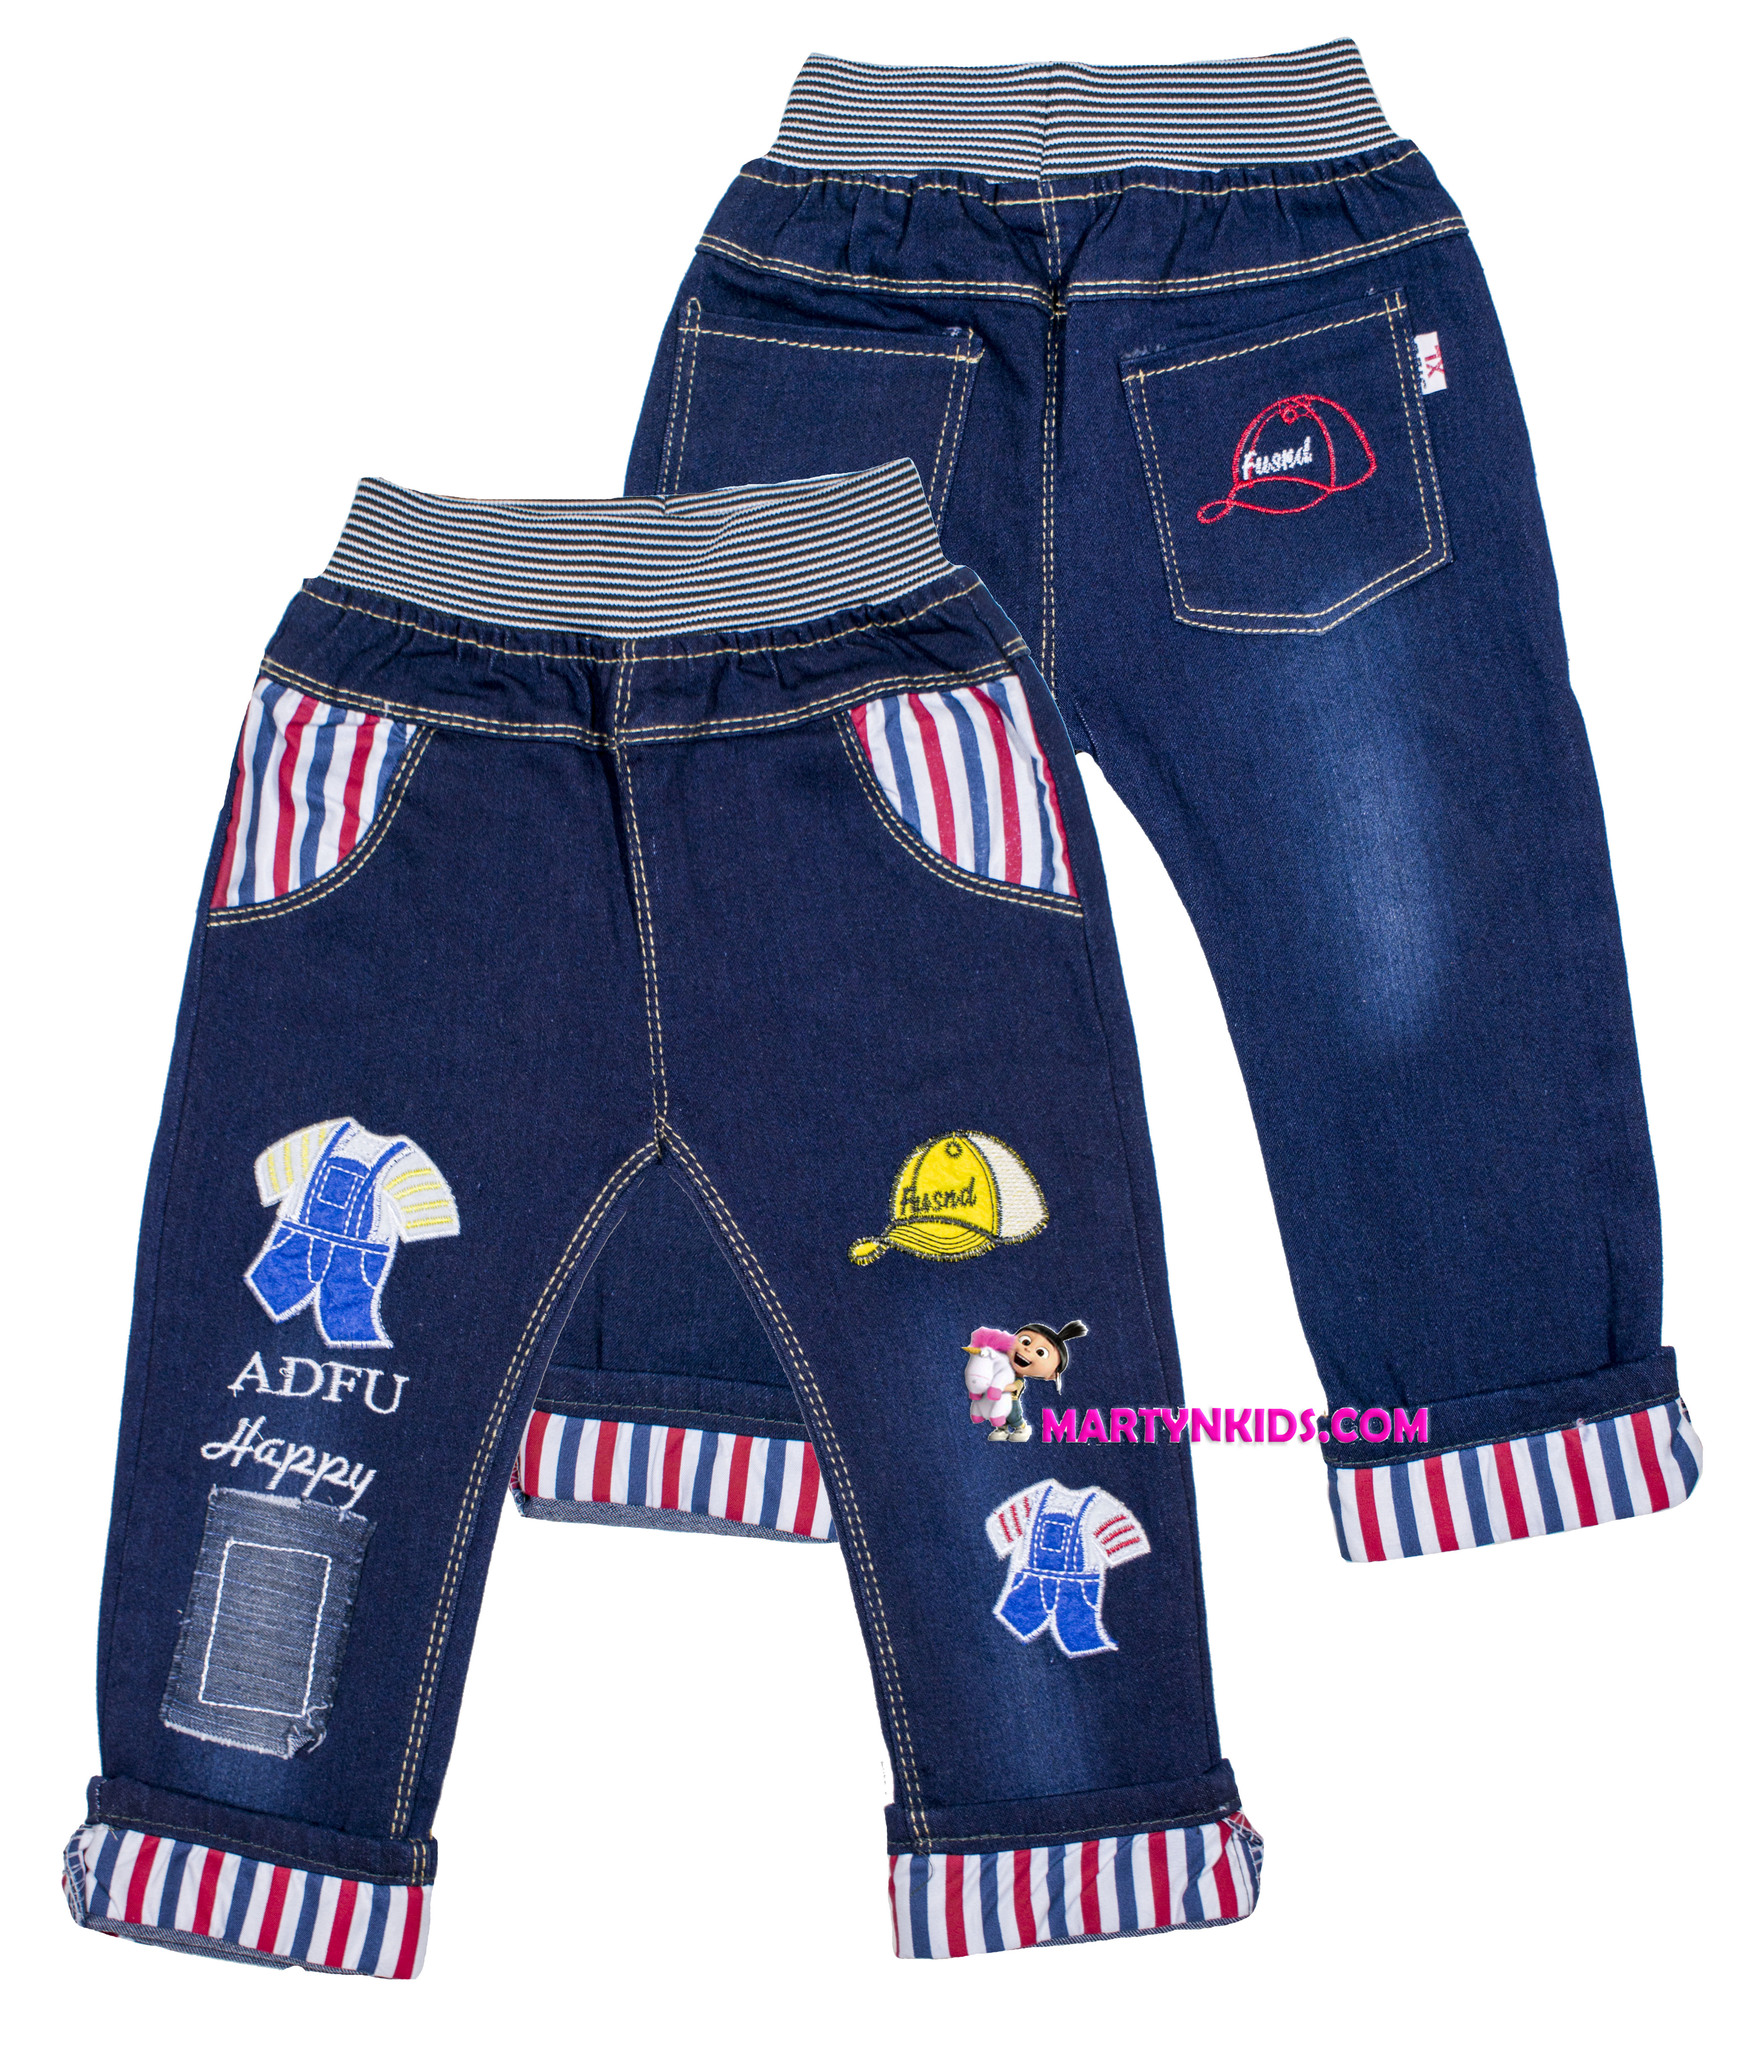 474 джинсы кепка